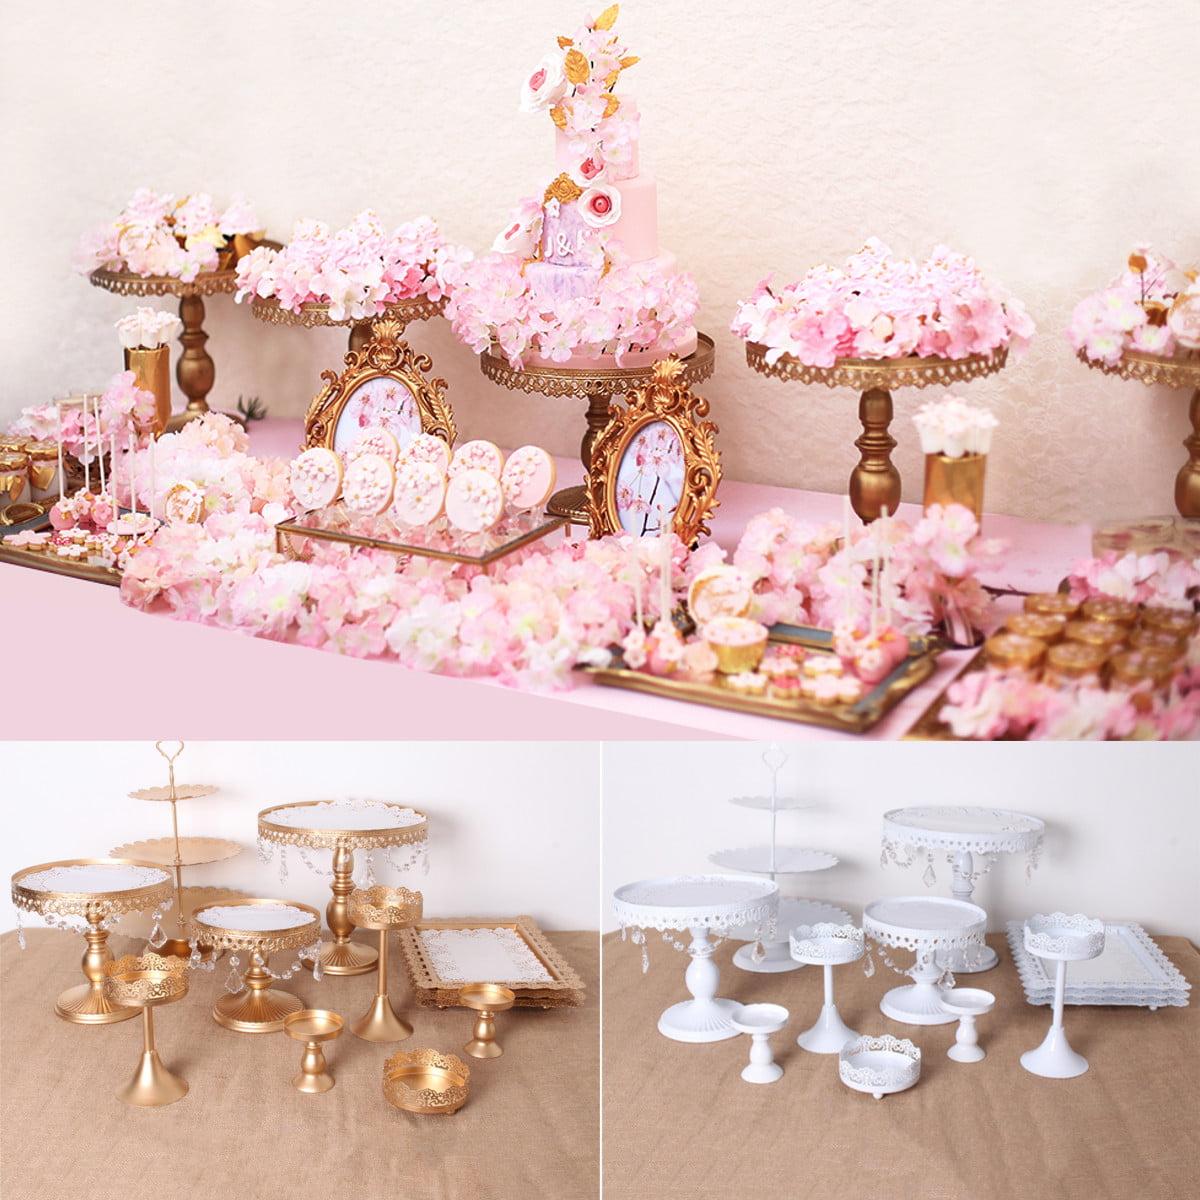 12Pcs Set Crystal Metal Cake Holder Cupcake Stand Birthday Wedding Party Display by